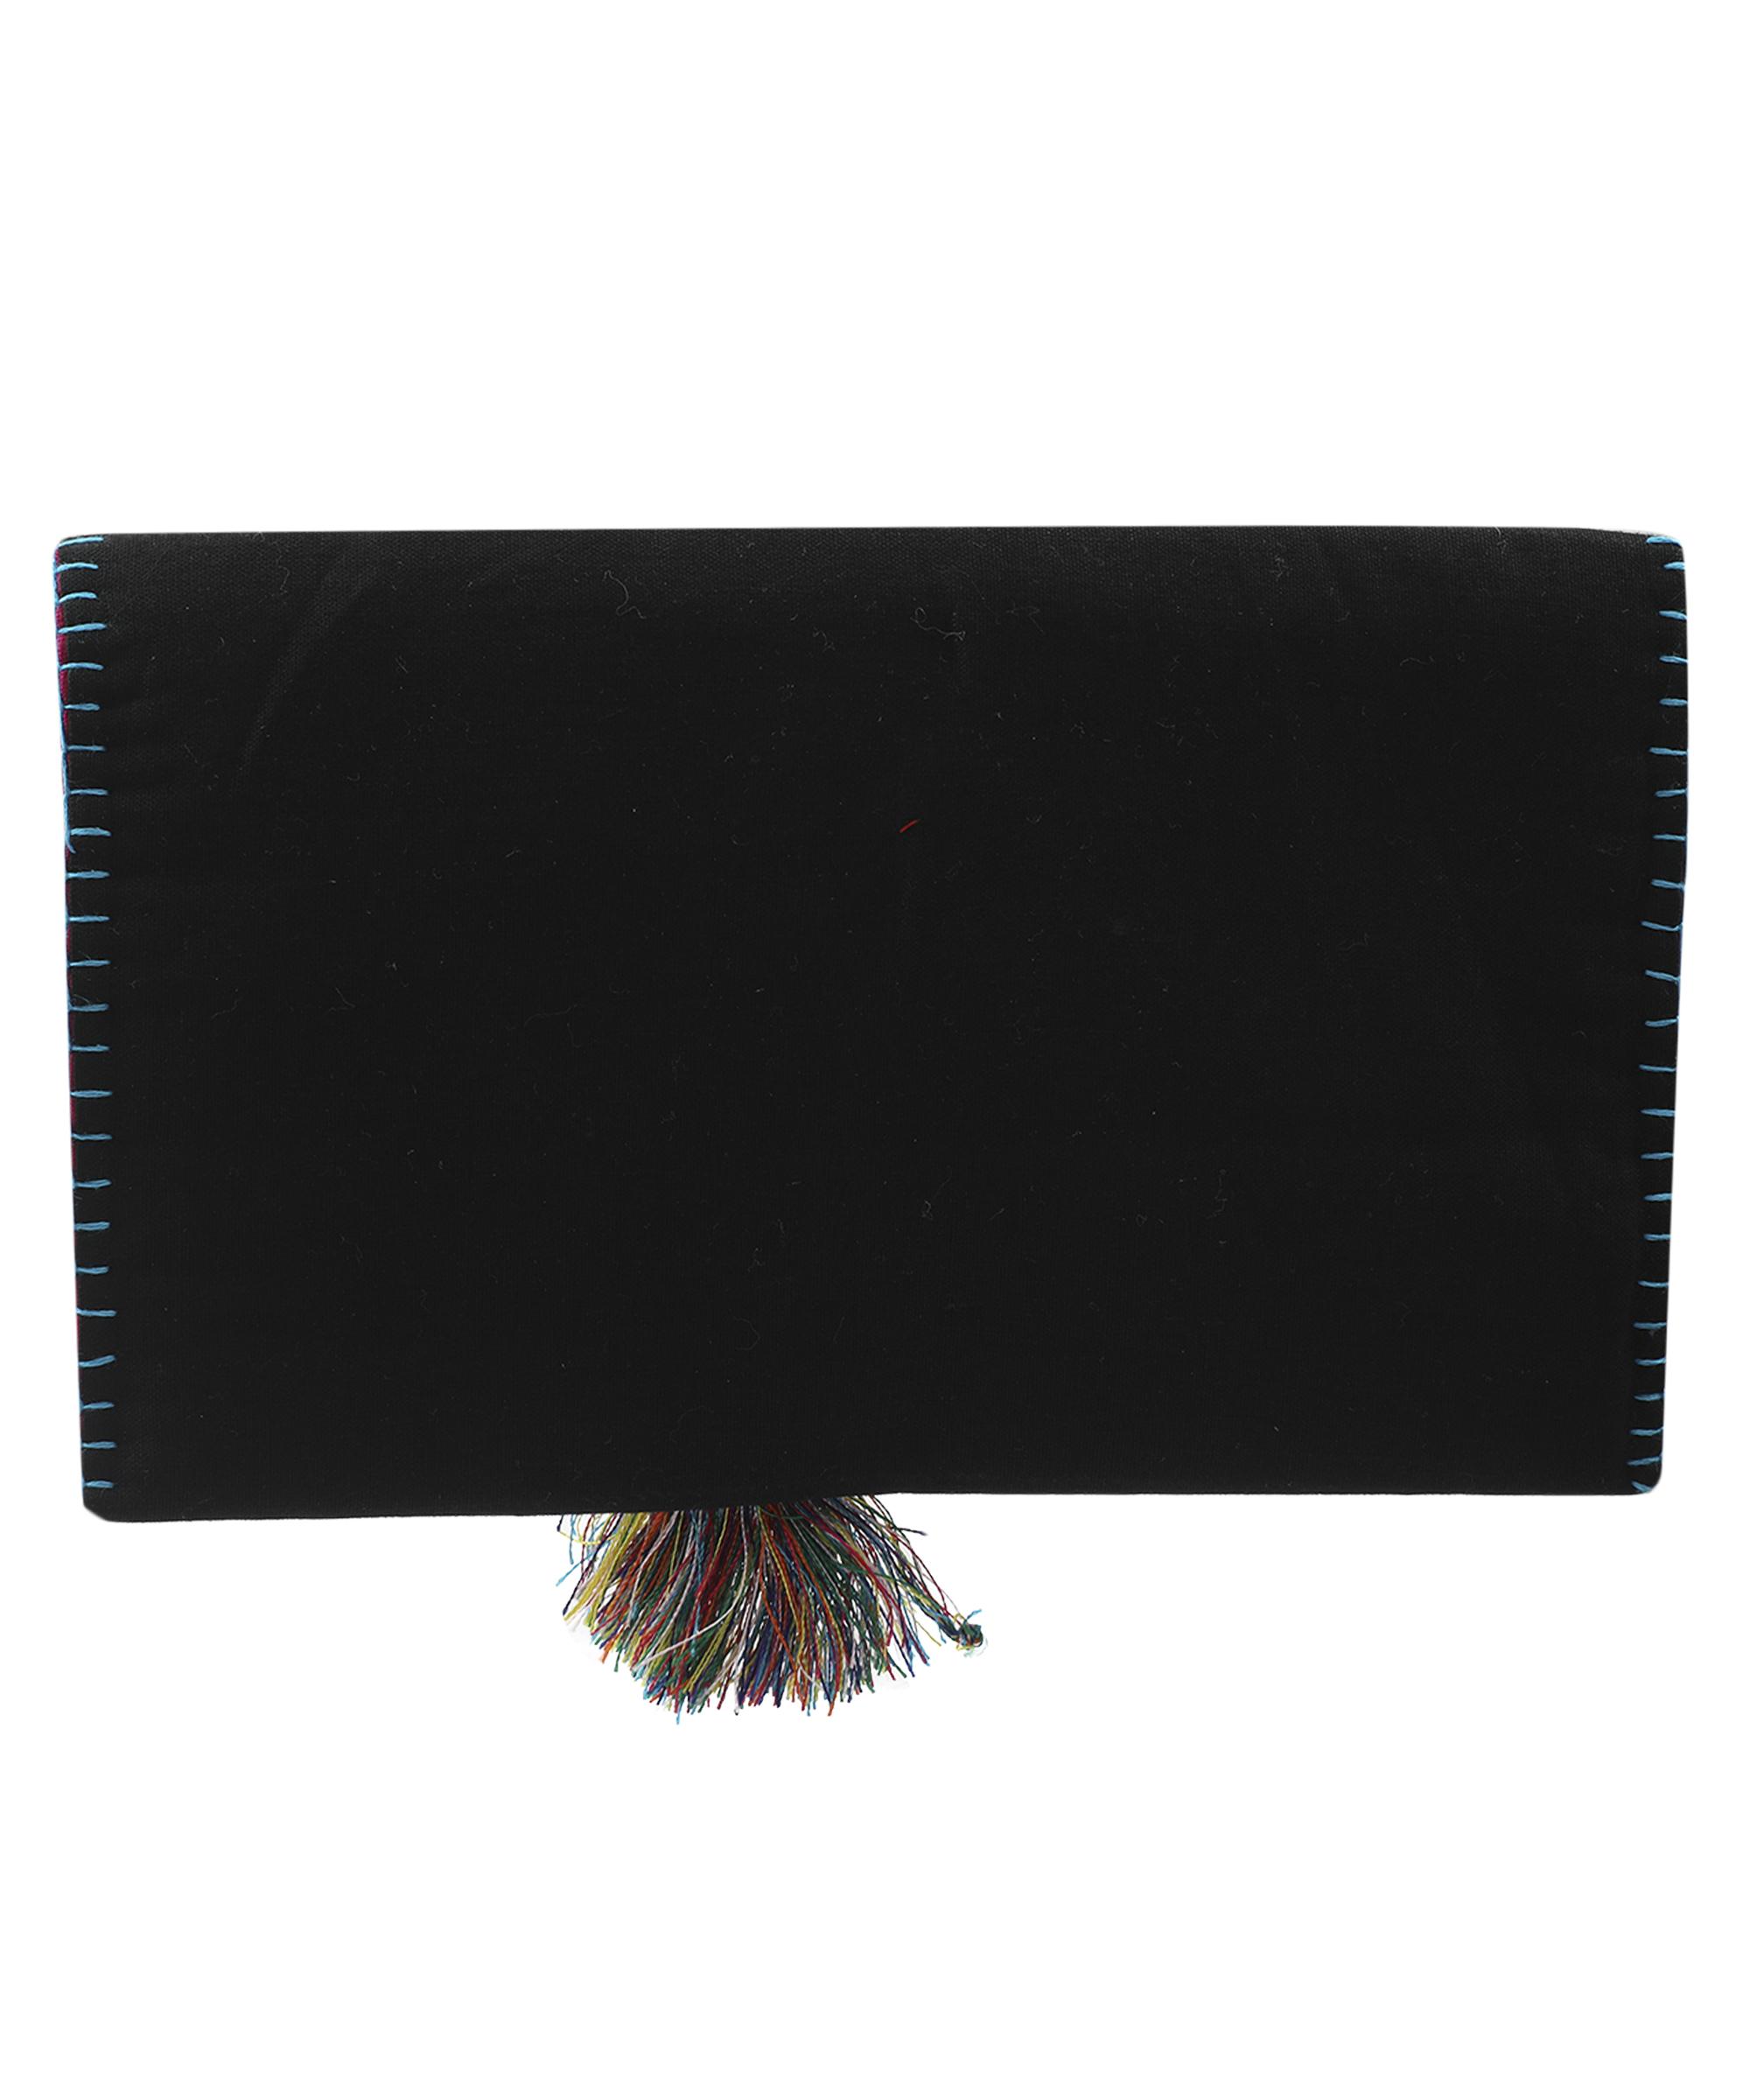 Women's Embroidered Clutch, Poplin Cotton Fabric (Spiral - Black) Slider Thumbnail 4/4